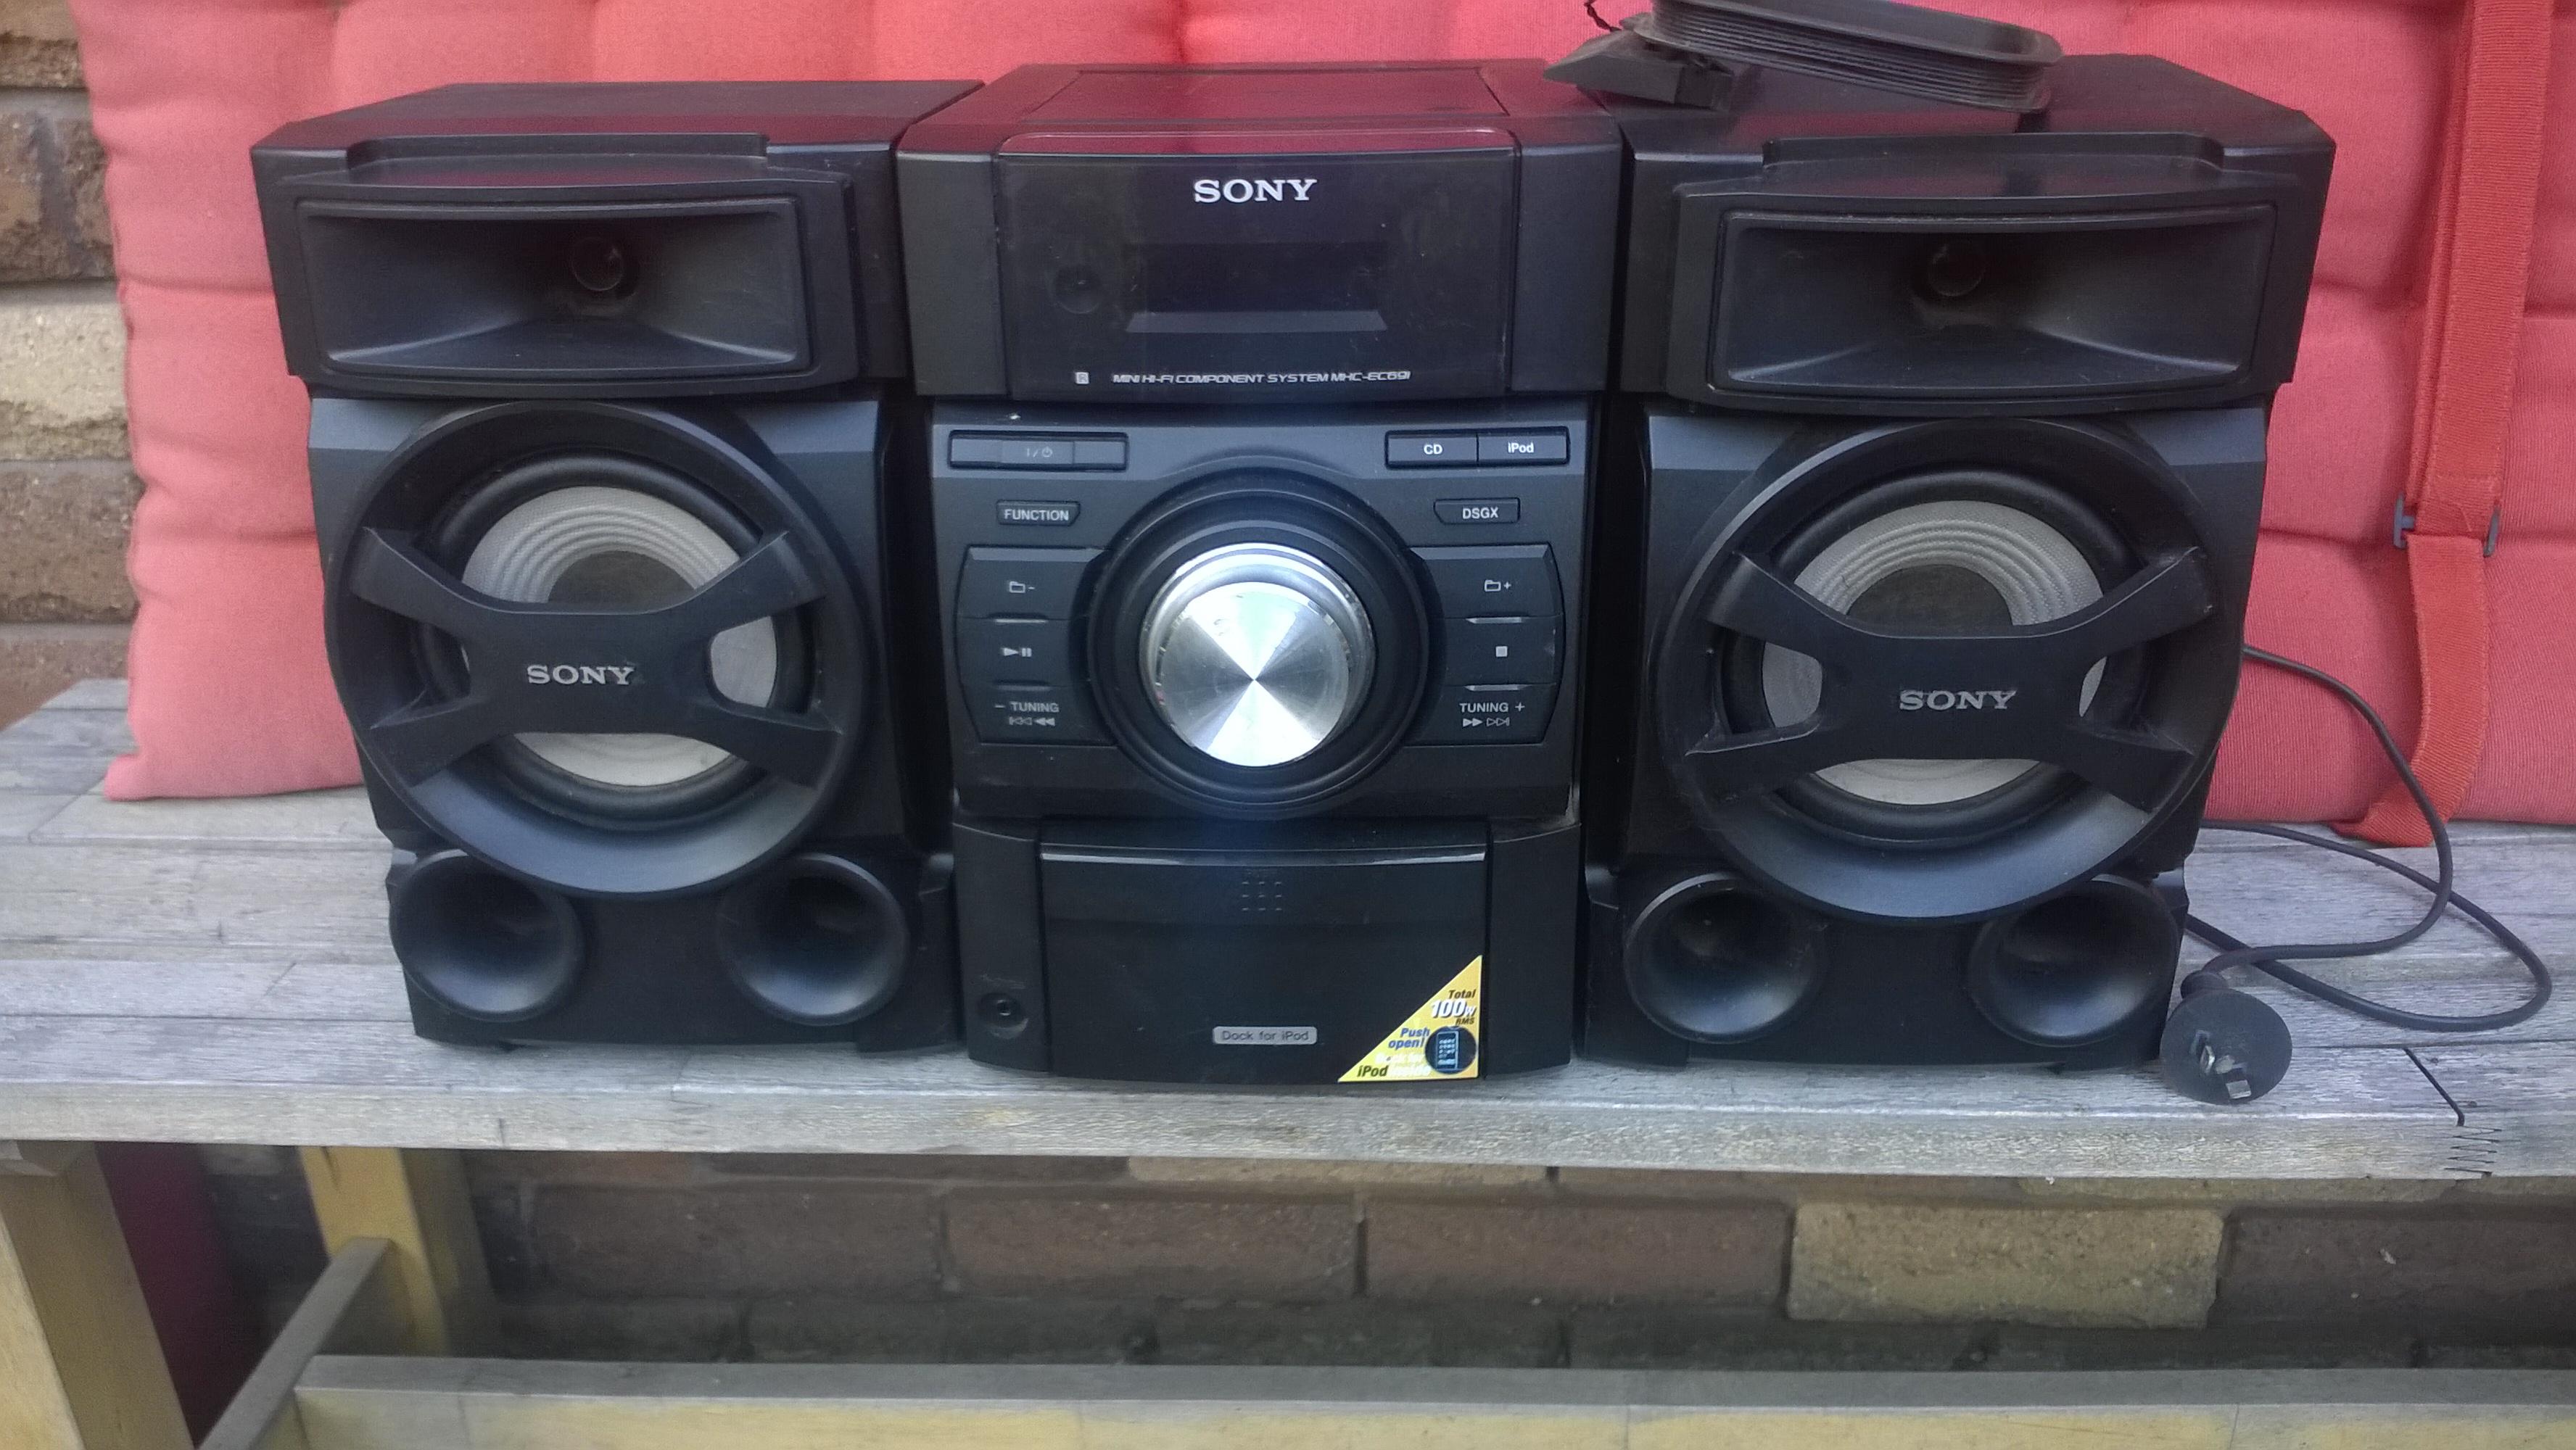 SONY Mini Hi Fi Stereo, Disc Player, IPod Dock, Radio Tuner – 80 W